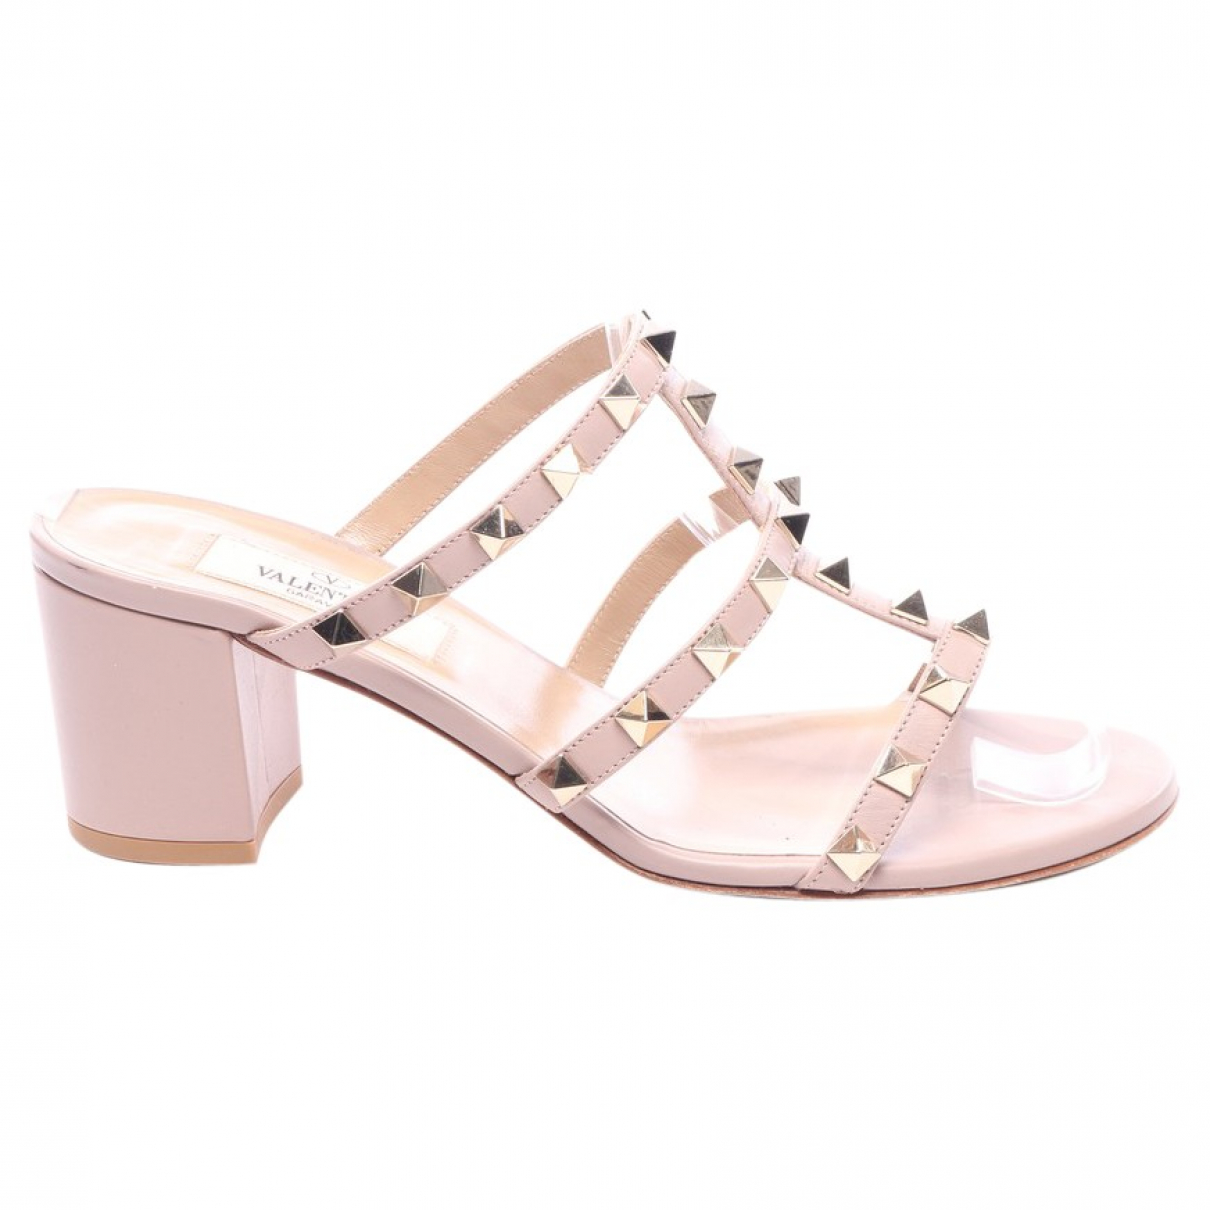 Valentino Garavani \N Brown Leather Sandals for Women 36.5 EU